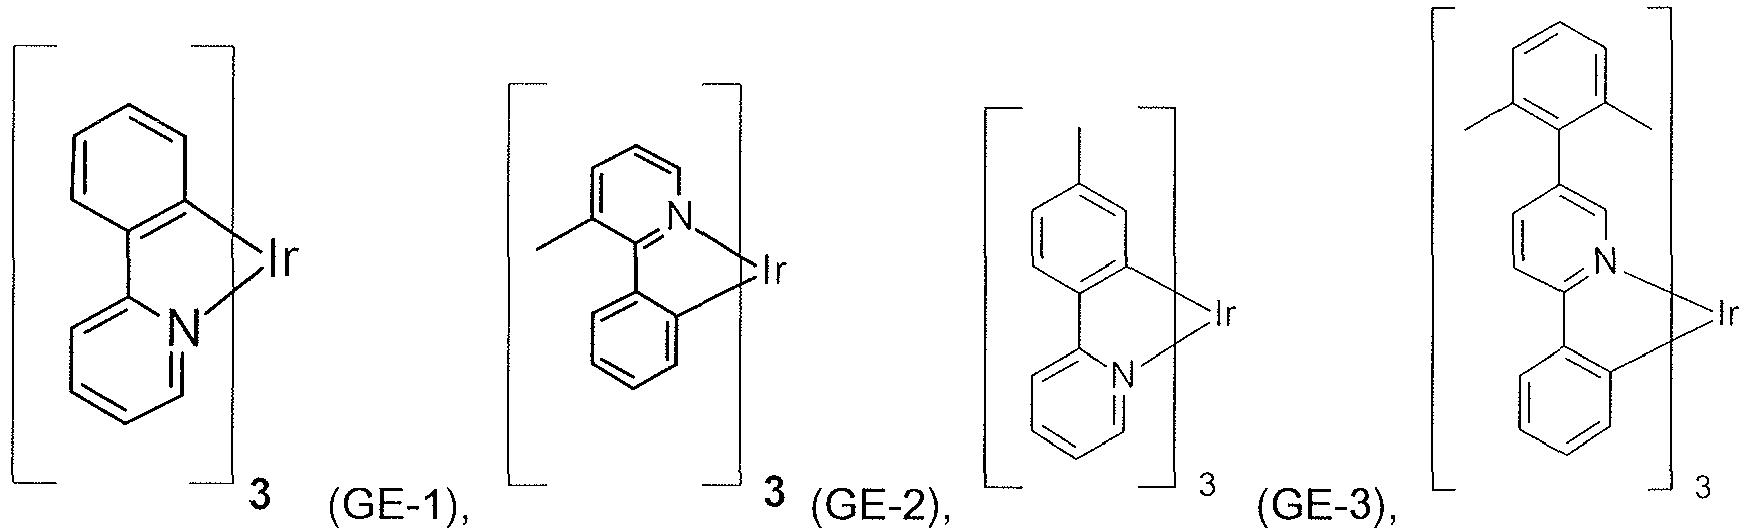 Figure imgb0651